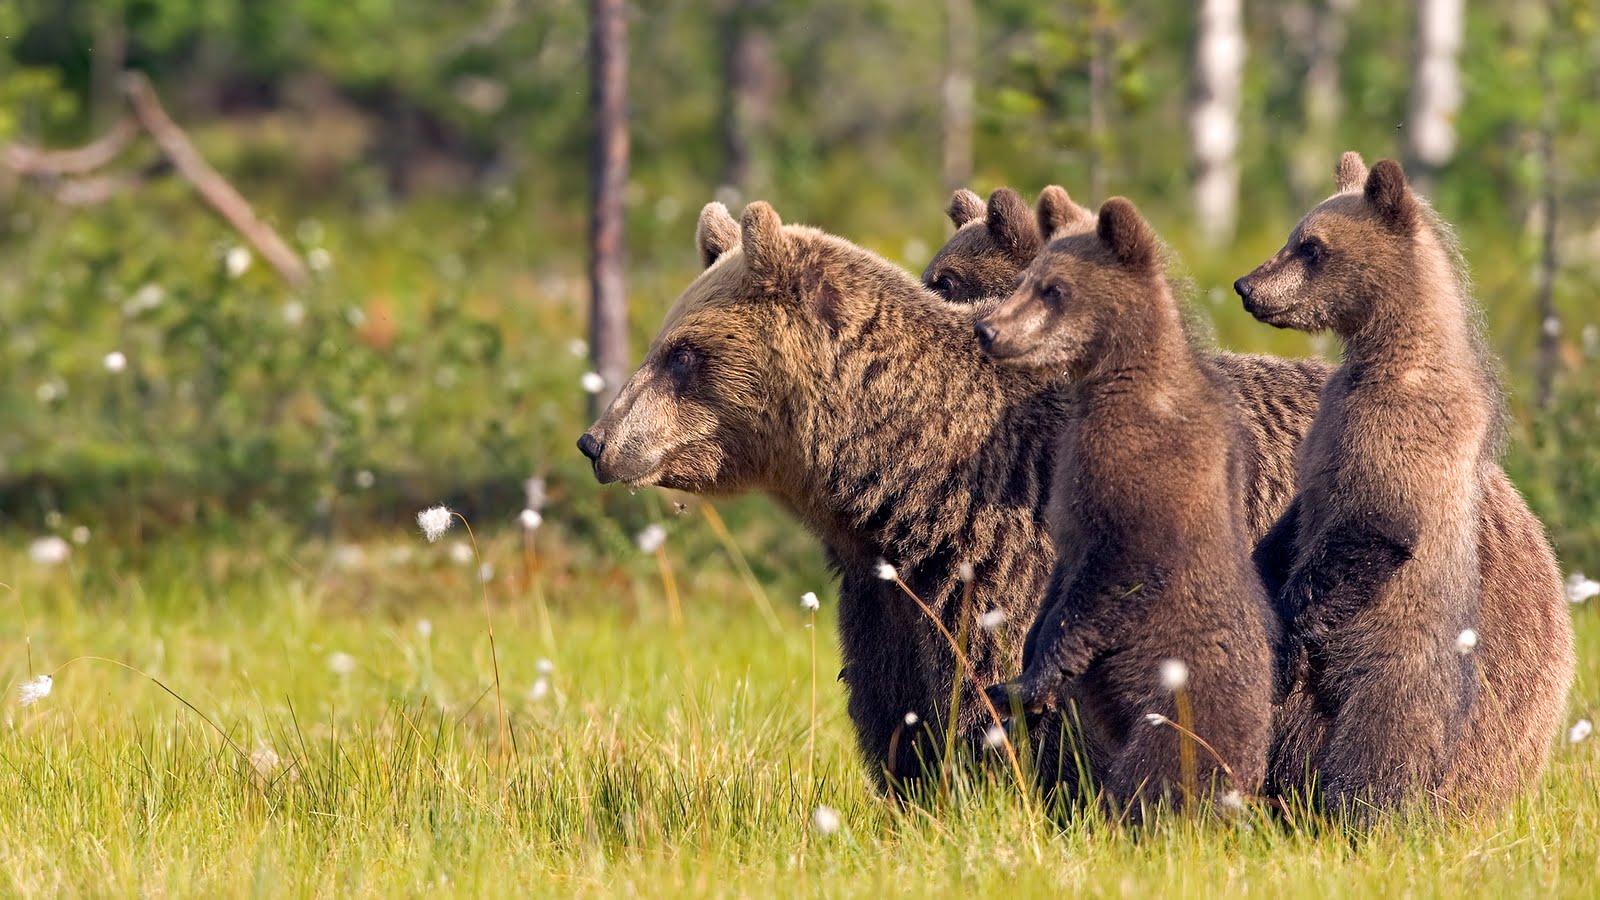 Free Image Bank: Hermosas criaturas del reino animal